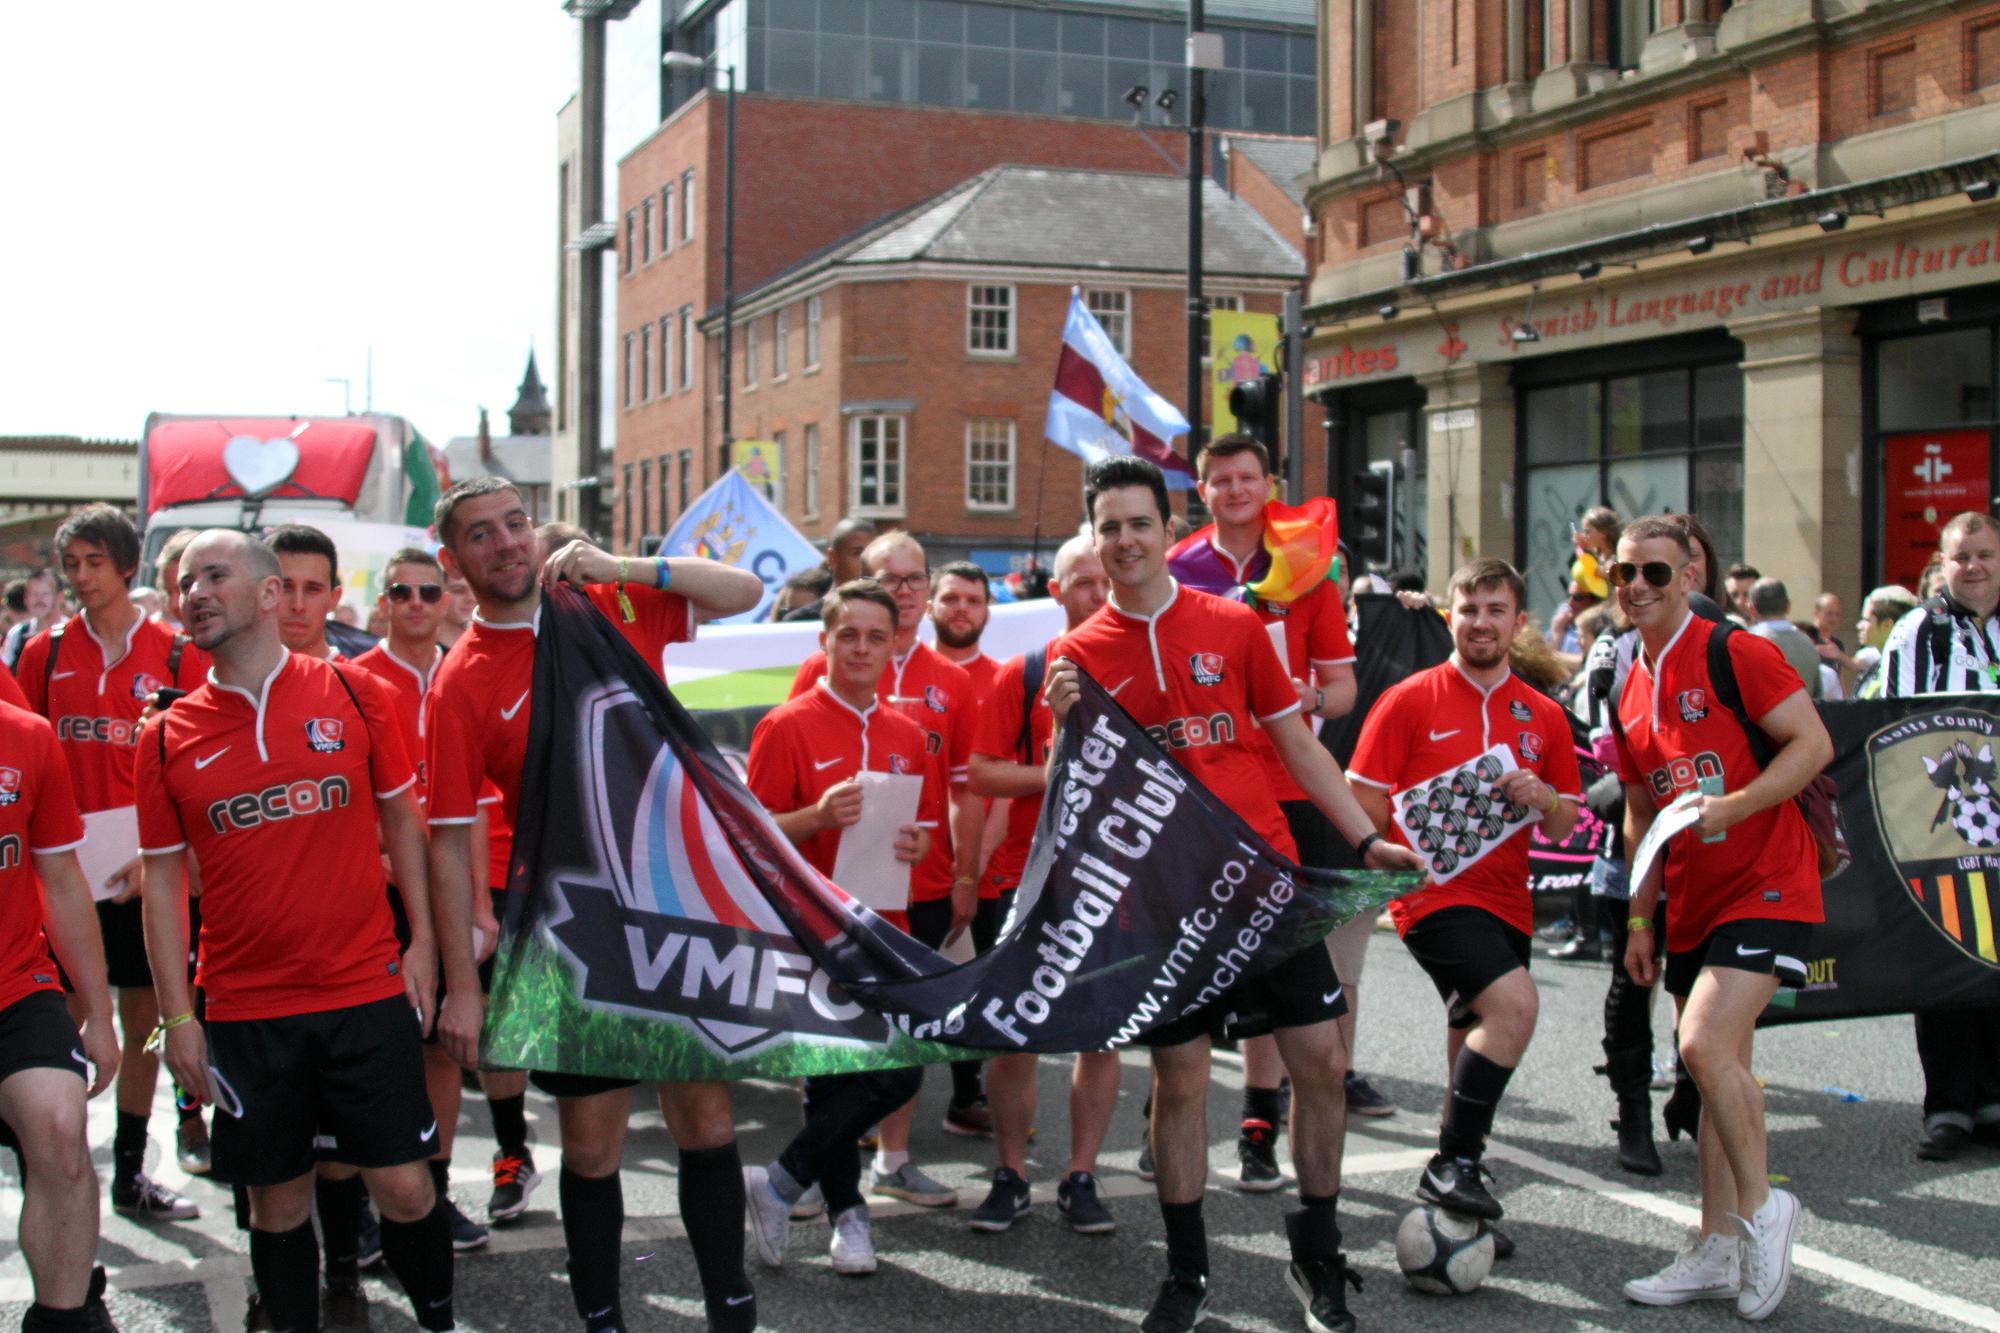 VMFC at Manchester Pride parade 2015  (16).jpg